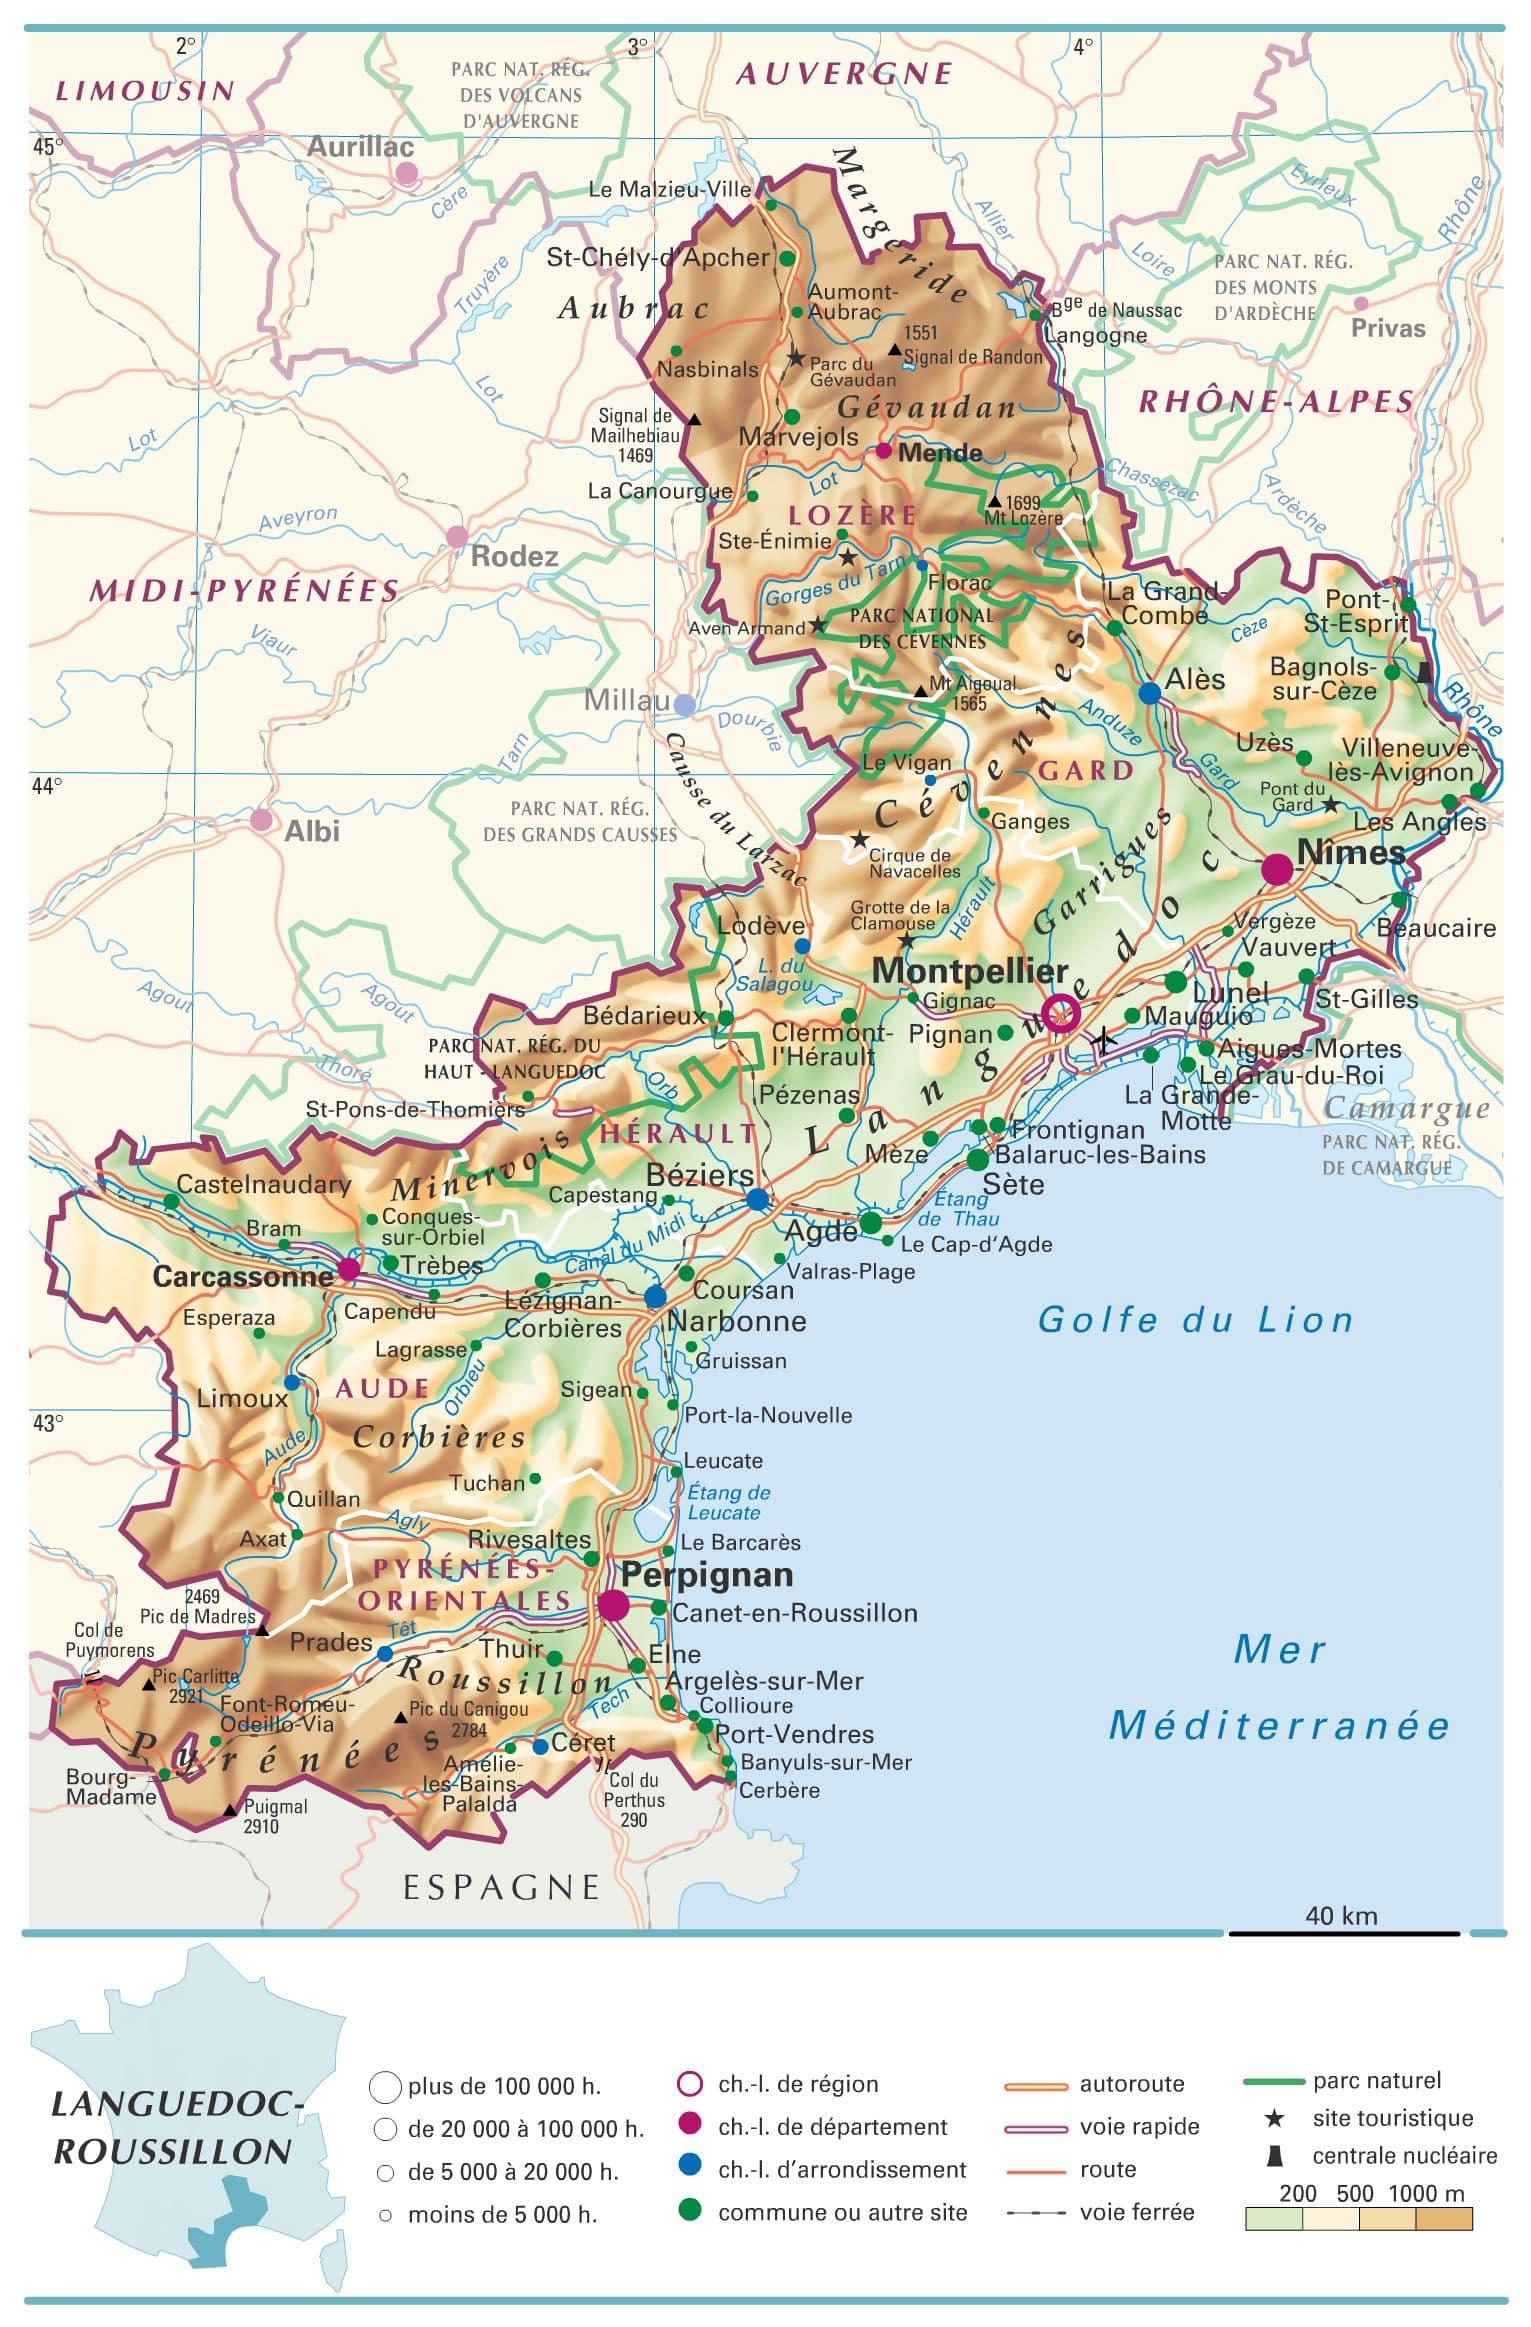 perpignan-region-languedoc-roussillon